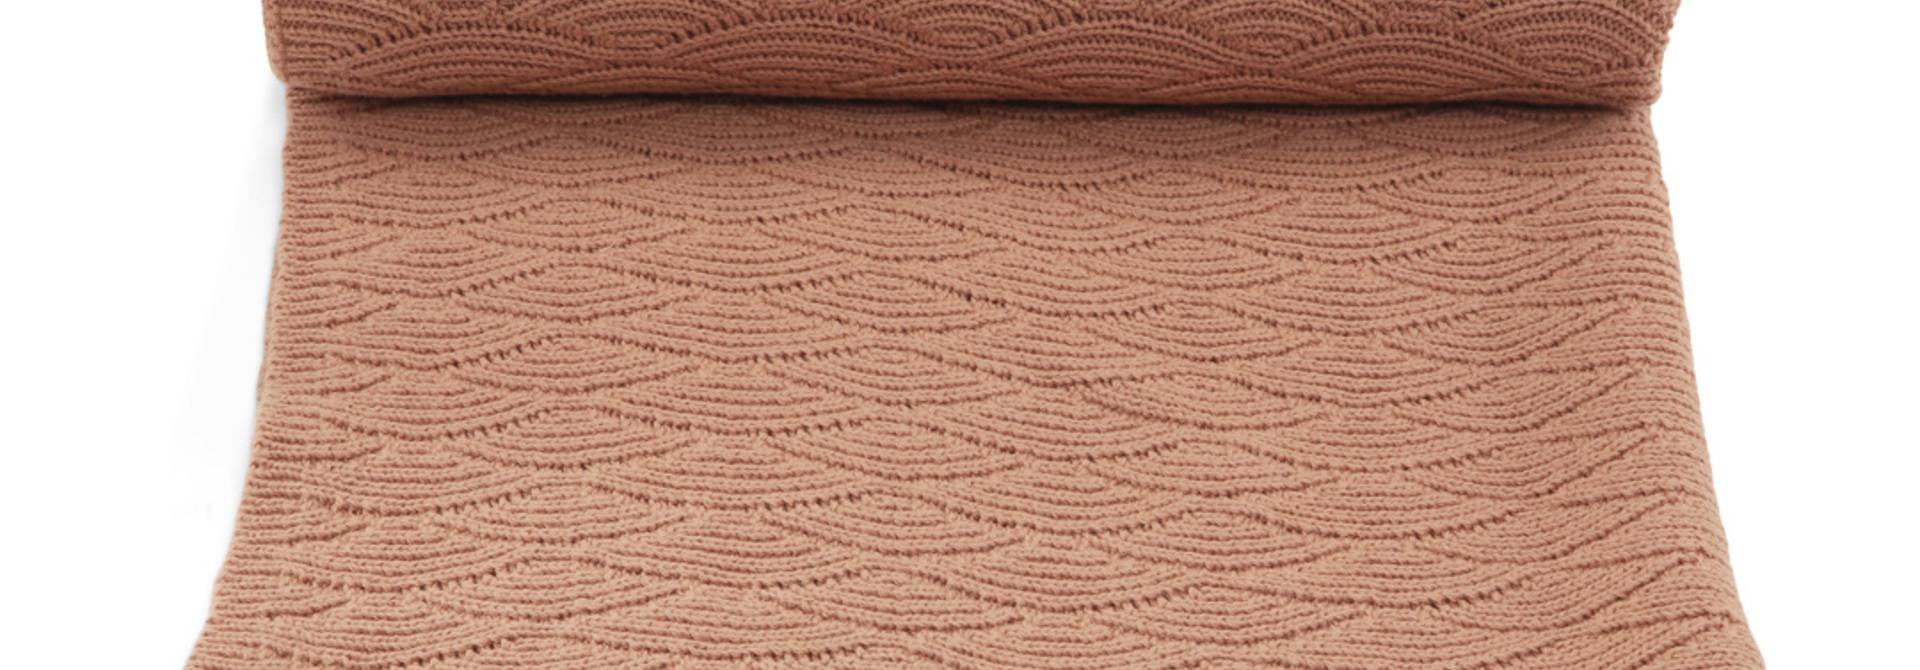 Pointelle Cotton Blanket